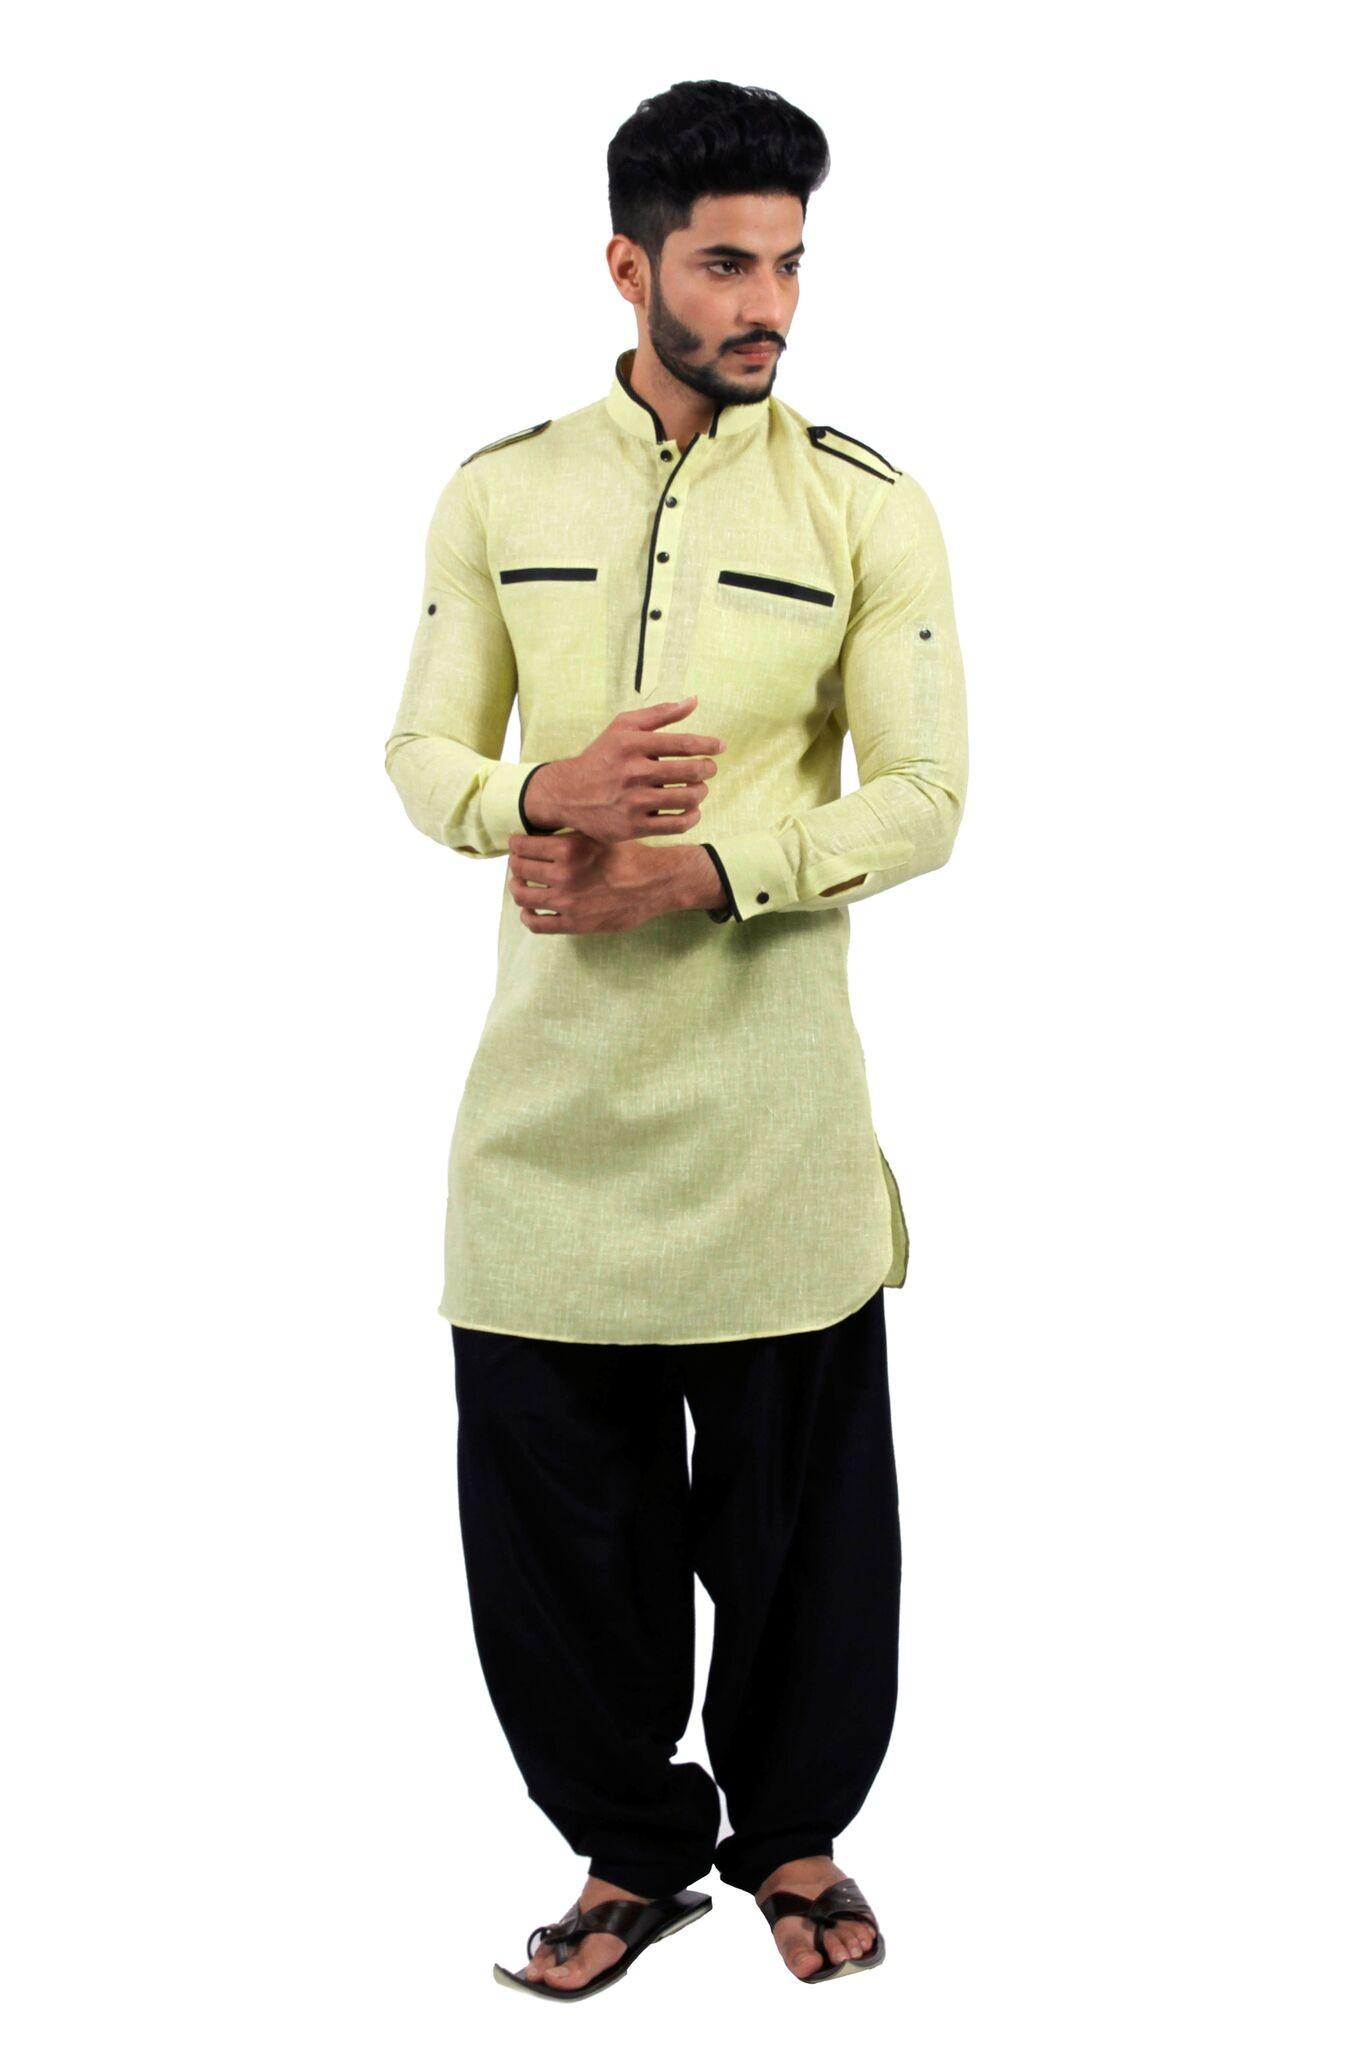 Conjunto de ropa árabe